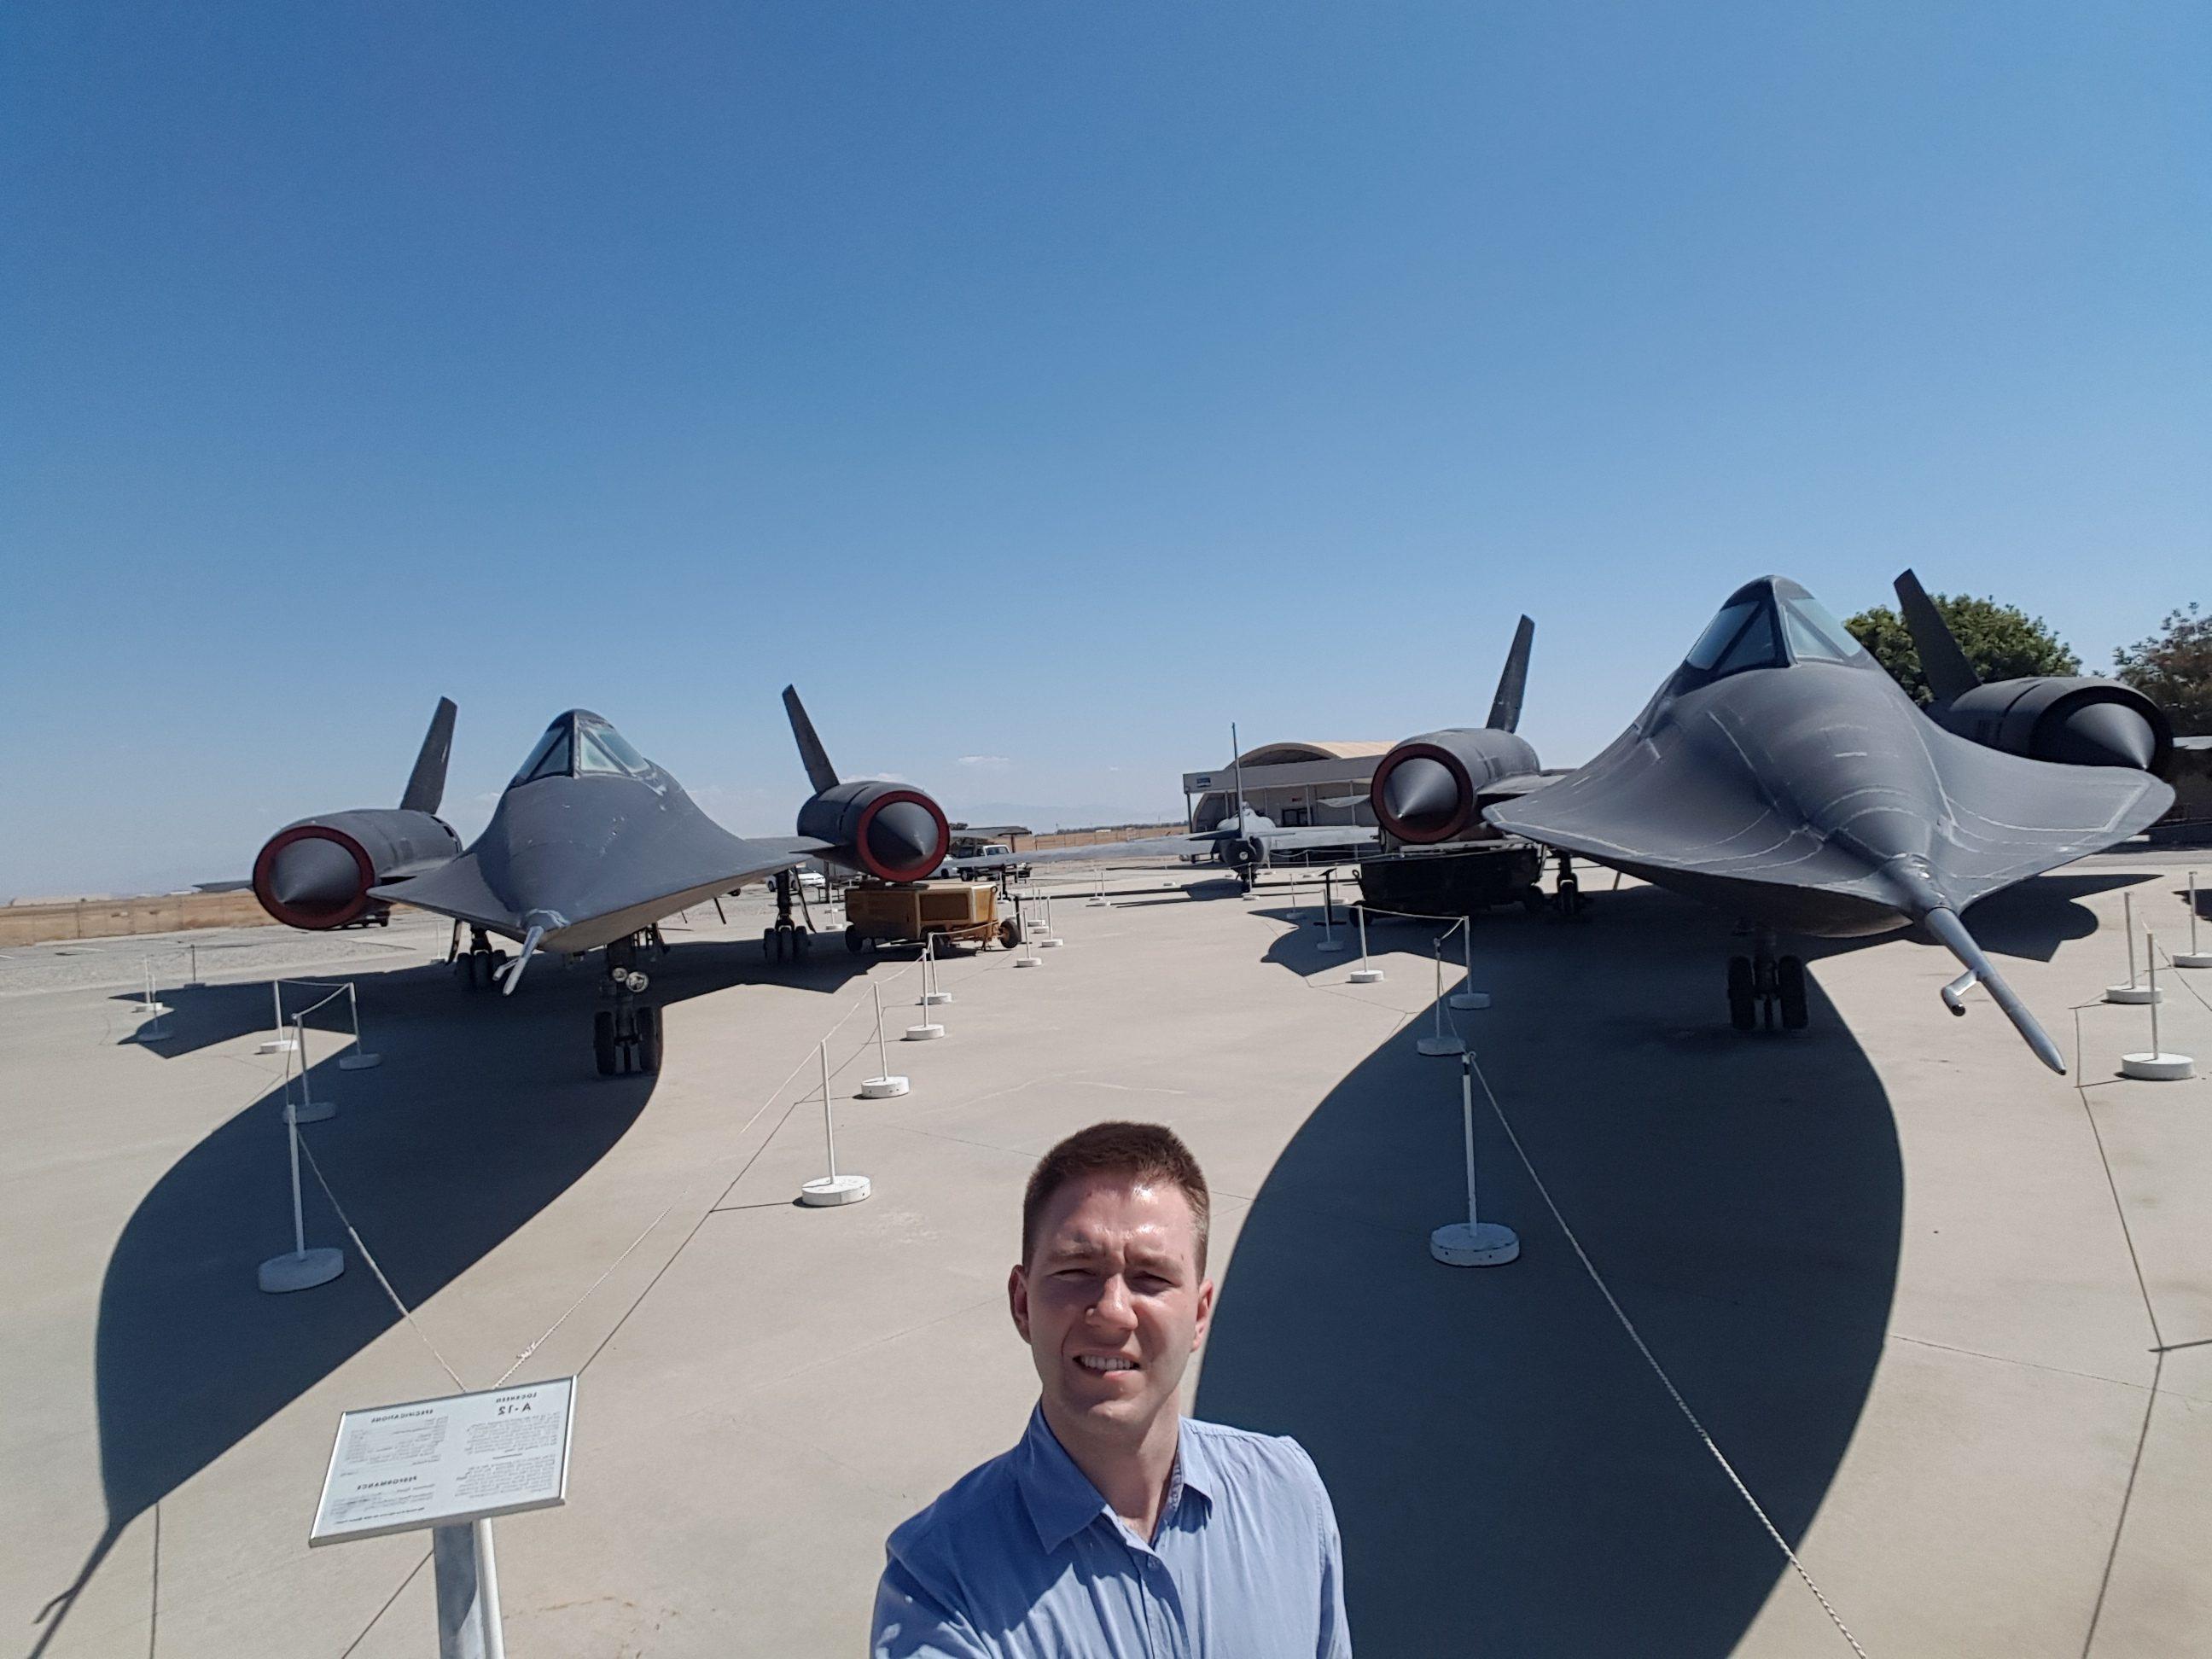 Selfie z Blackbirdem jest cool, a z dwoma? :-D